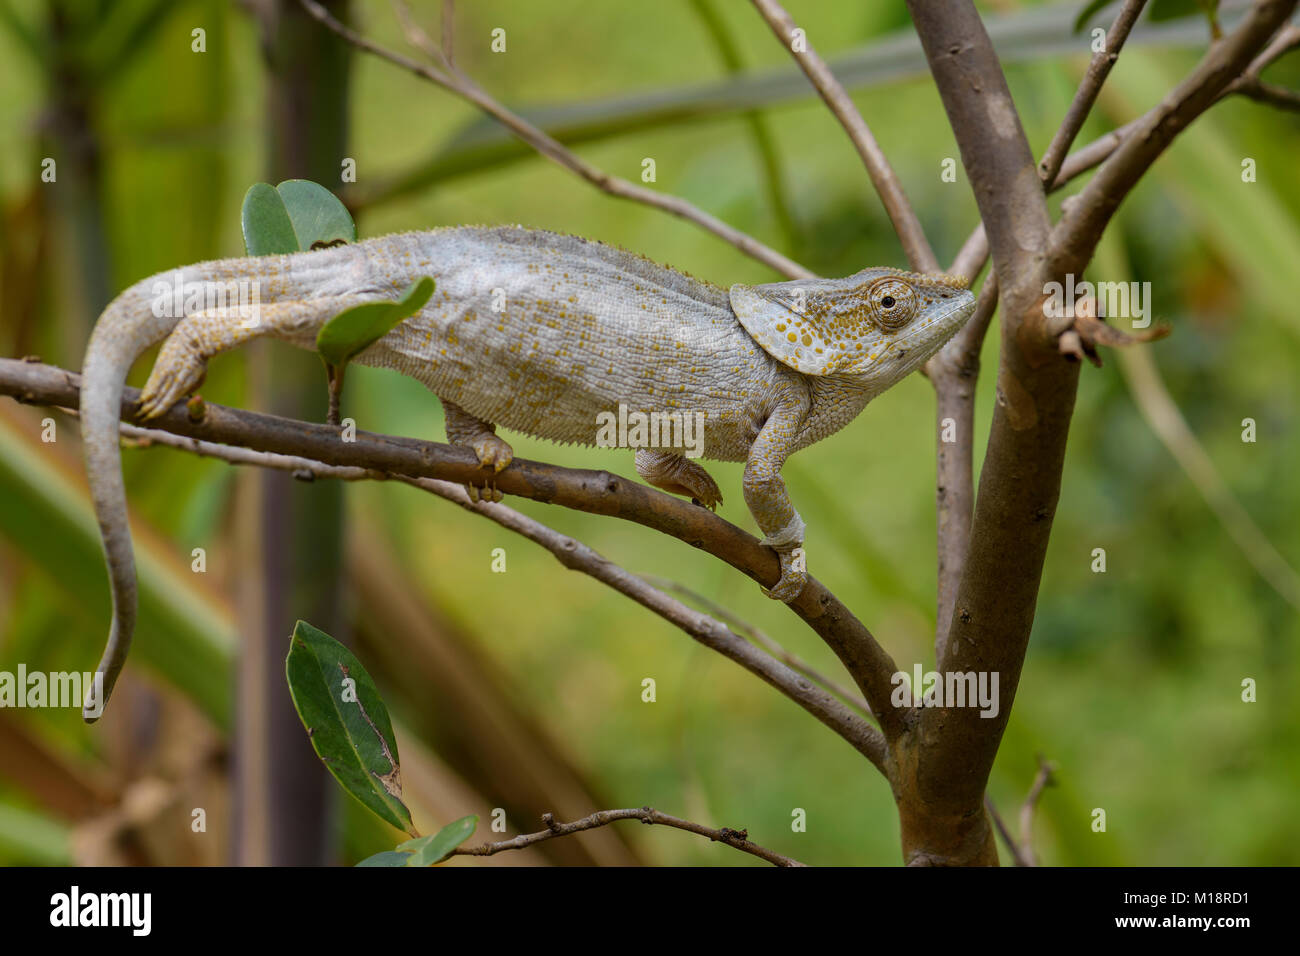 Curto-cornudo Chameleon - brevicorne Calumma, Estados Unidos rain forest. Belo lagarto colorido. Orelha de elefante. Imagens de Stock